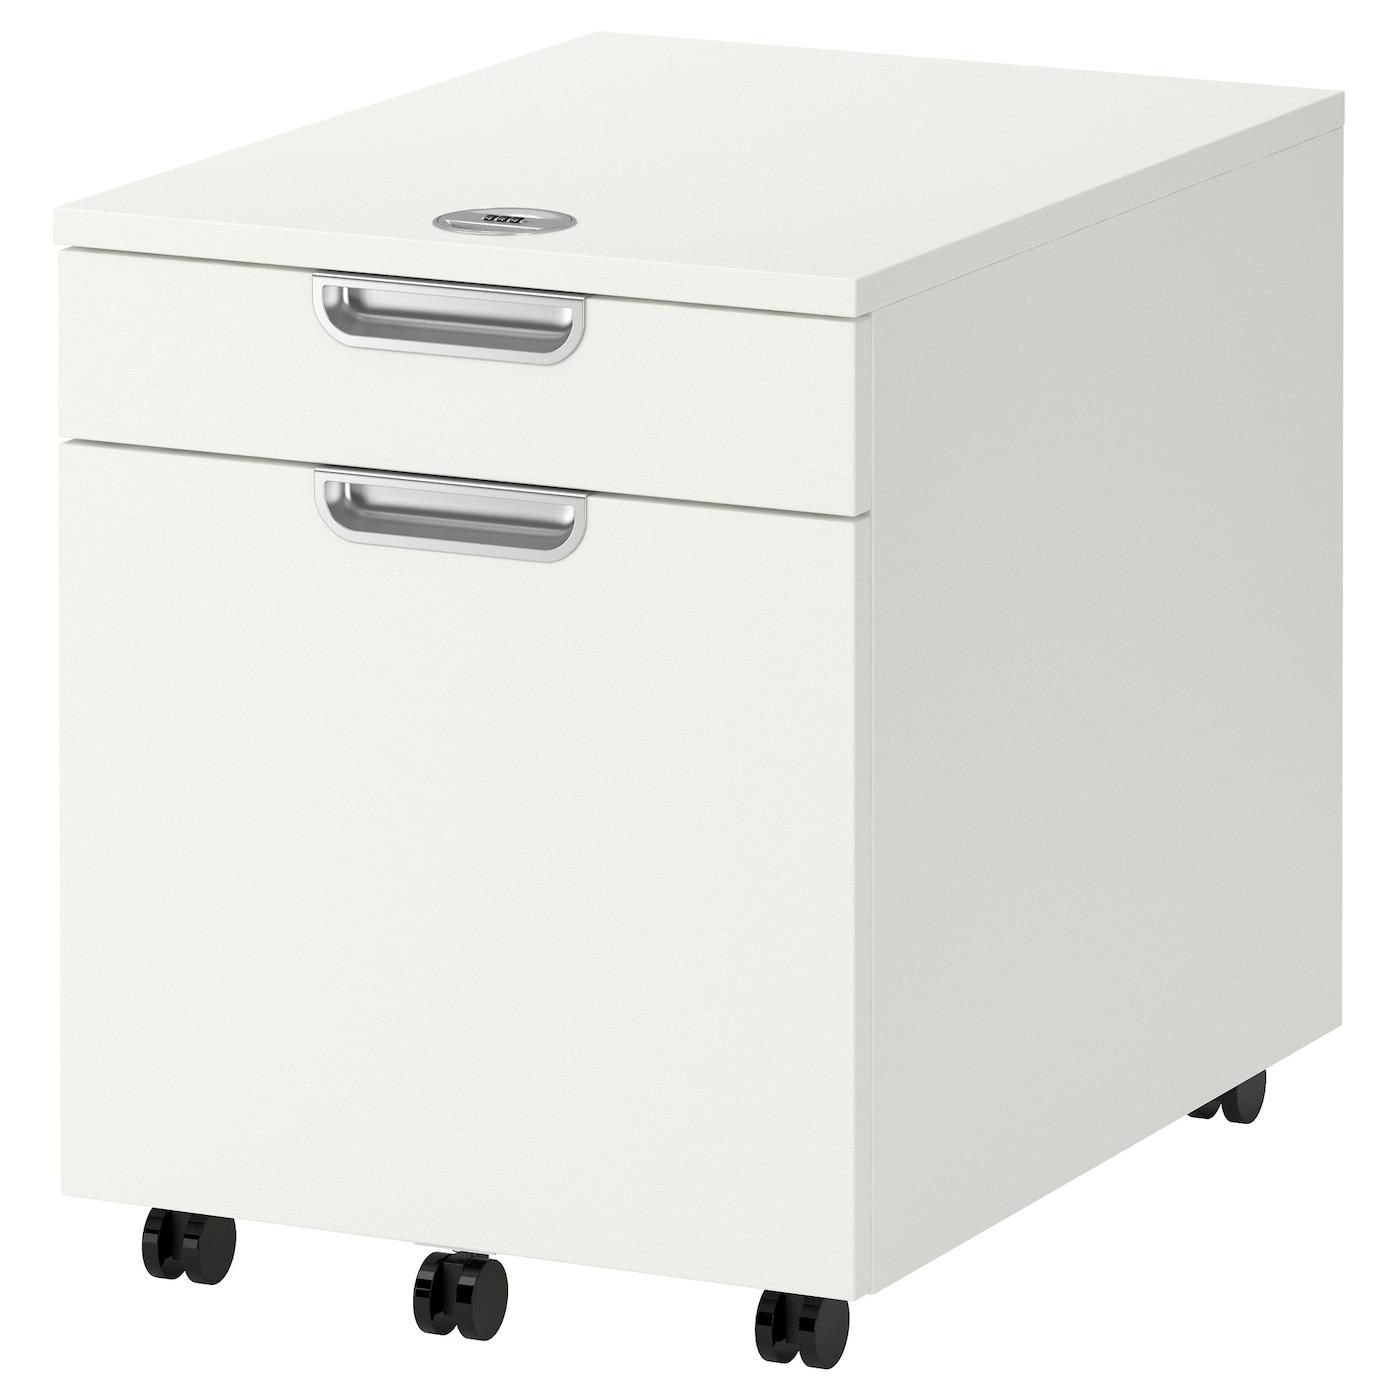 GALANT Drawer unit with drop-file storage White 45 x 55 cm ...